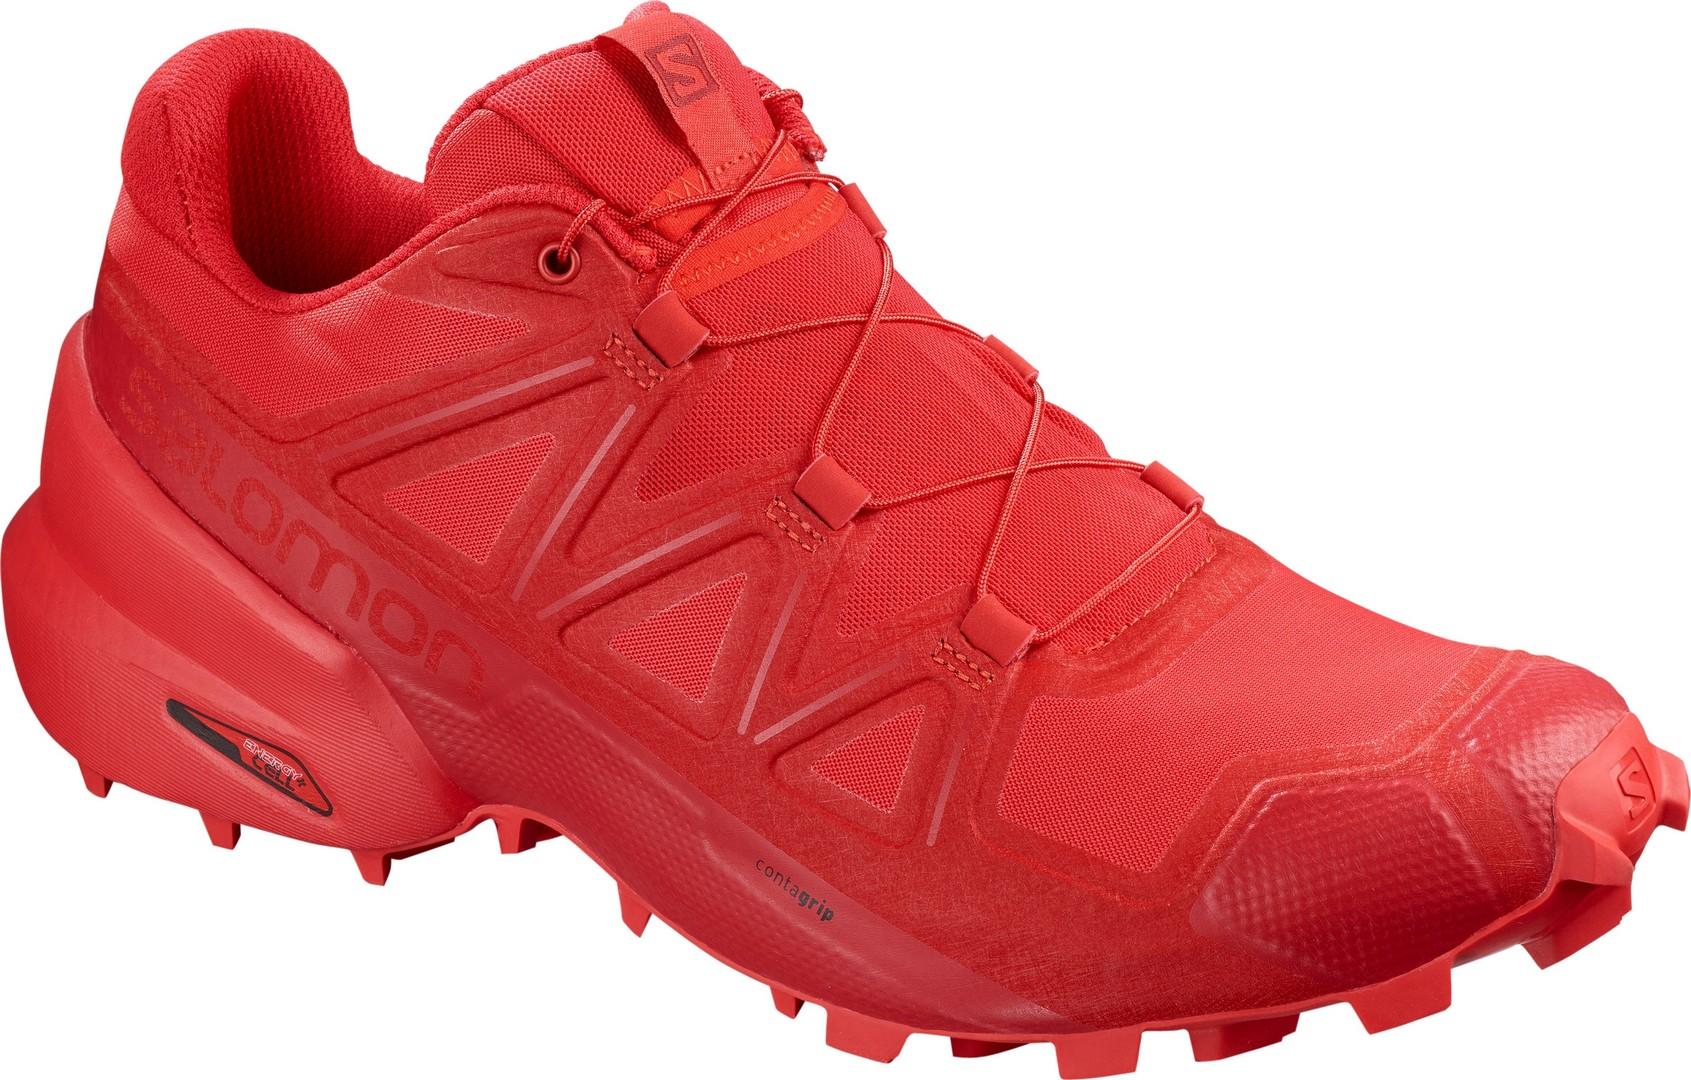 Salomon SPEEDCROSS 5, muške tenisice za trčanje, crvena